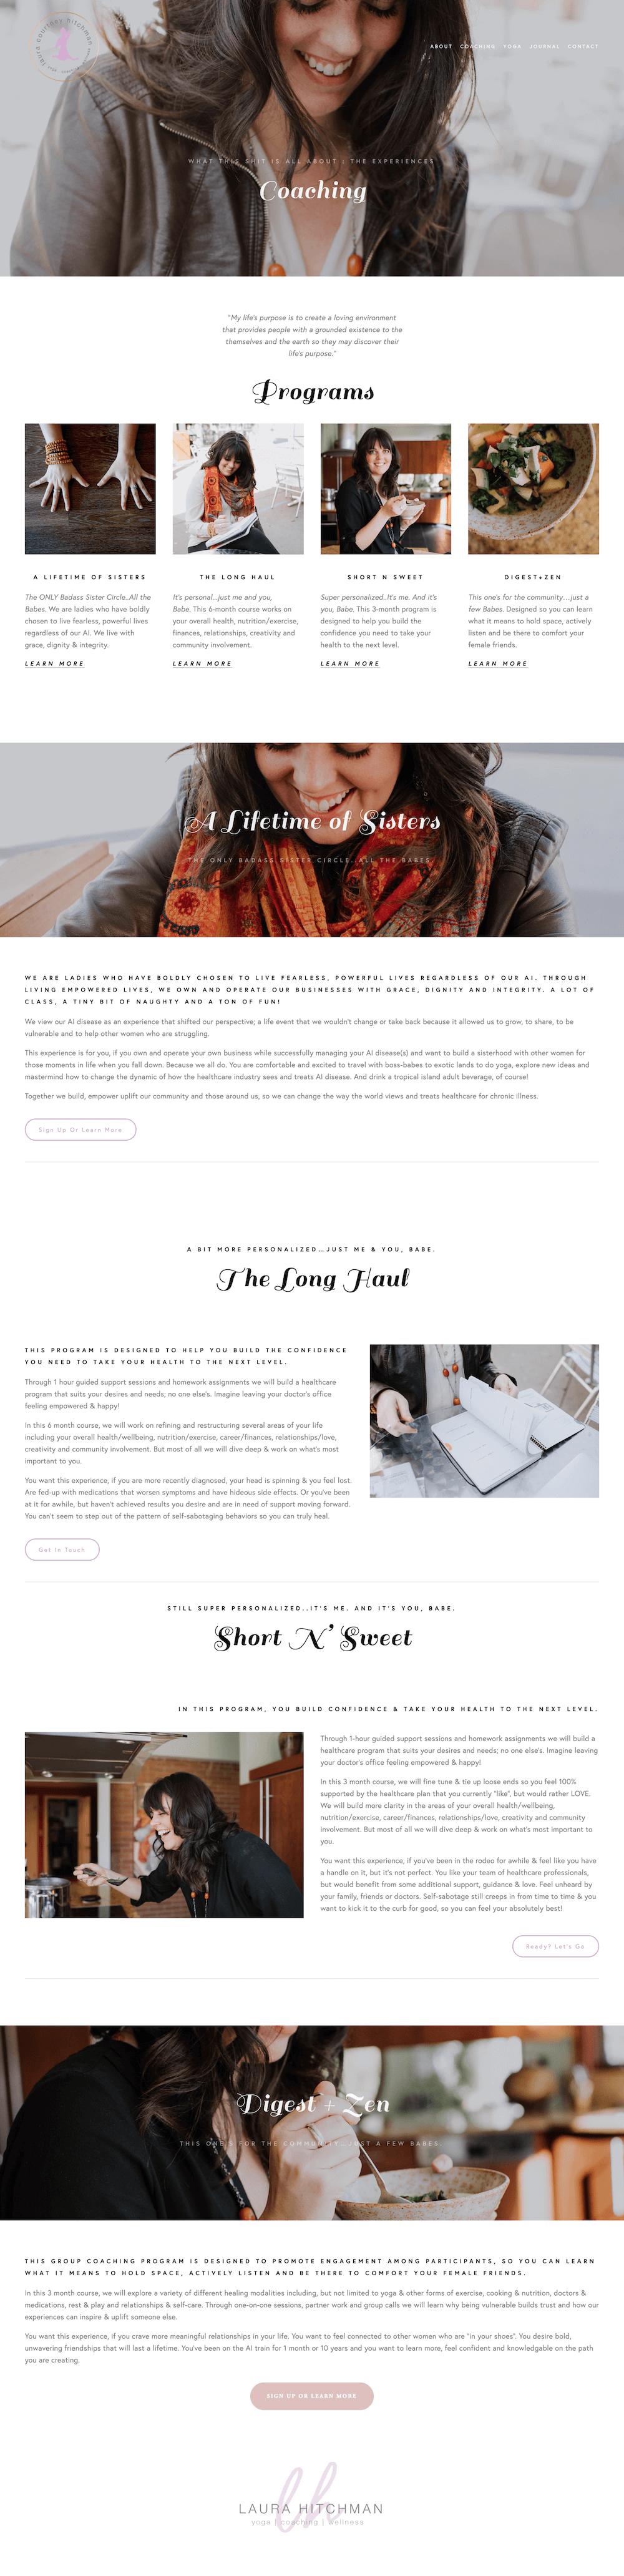 website-web-design-branding-yoga-wellness-health-coaching-entrepreneur-squarespace-diy